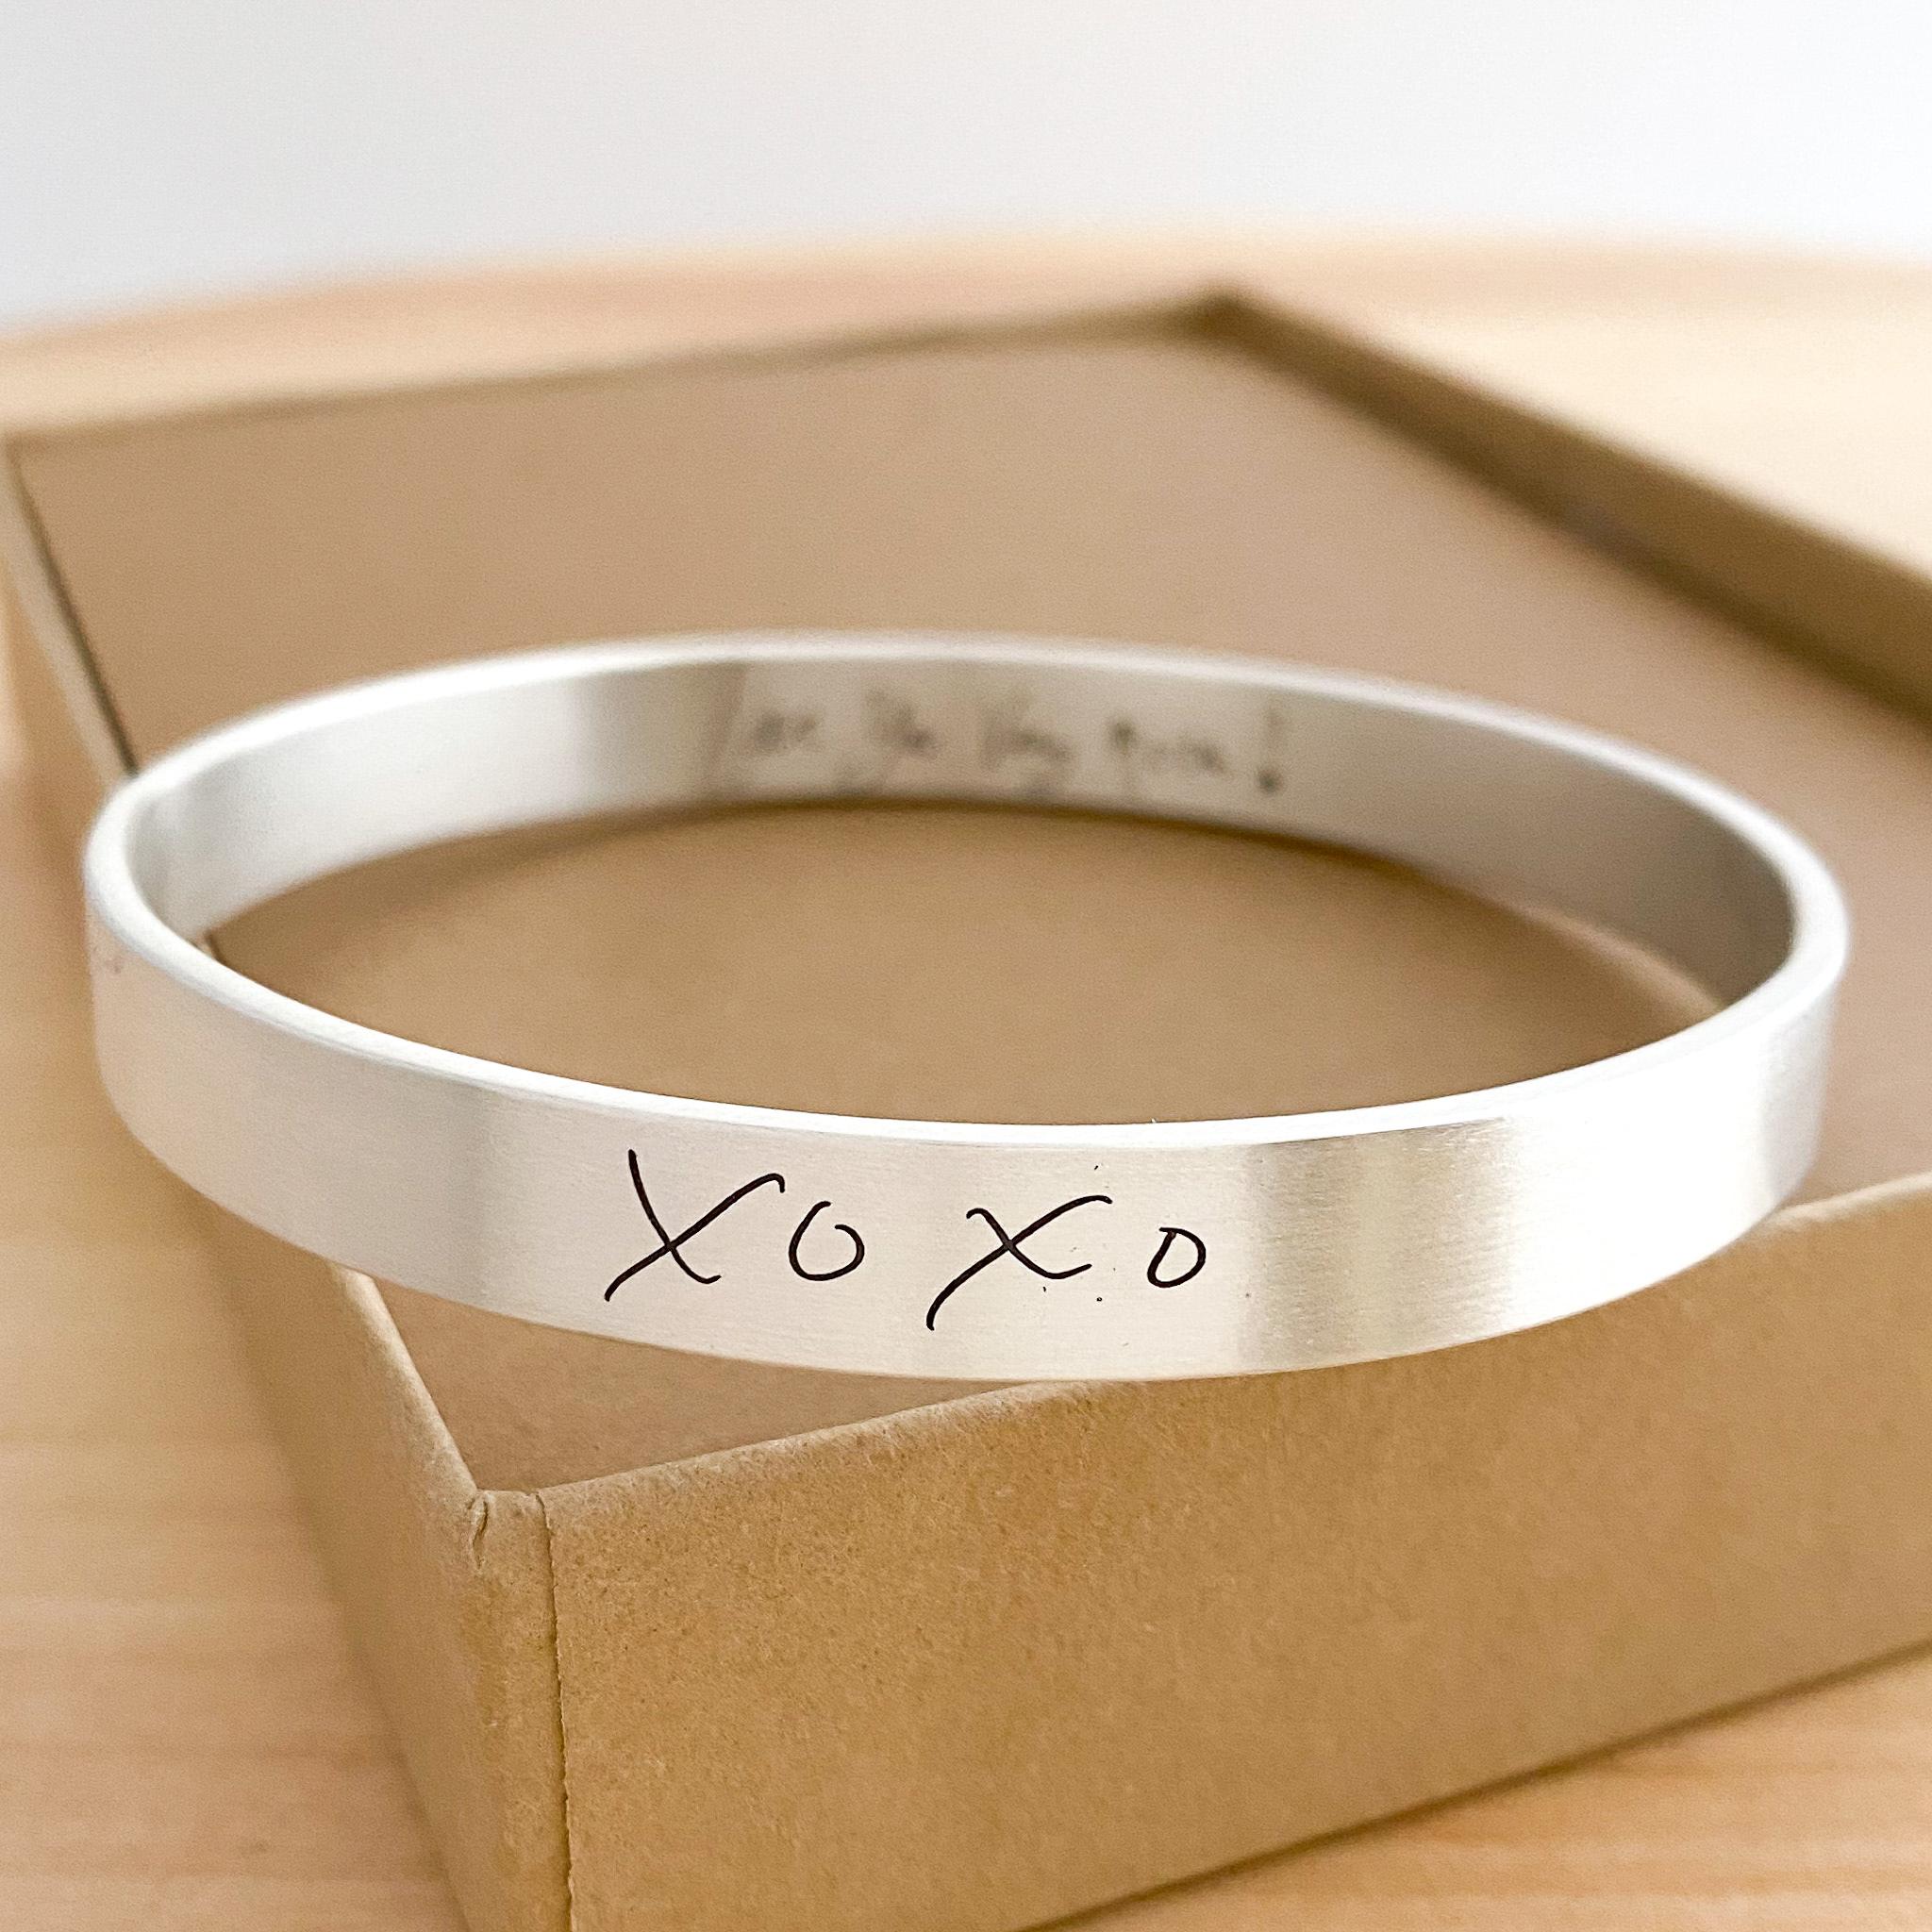 Custom Bracelets from Scripted Jewelry